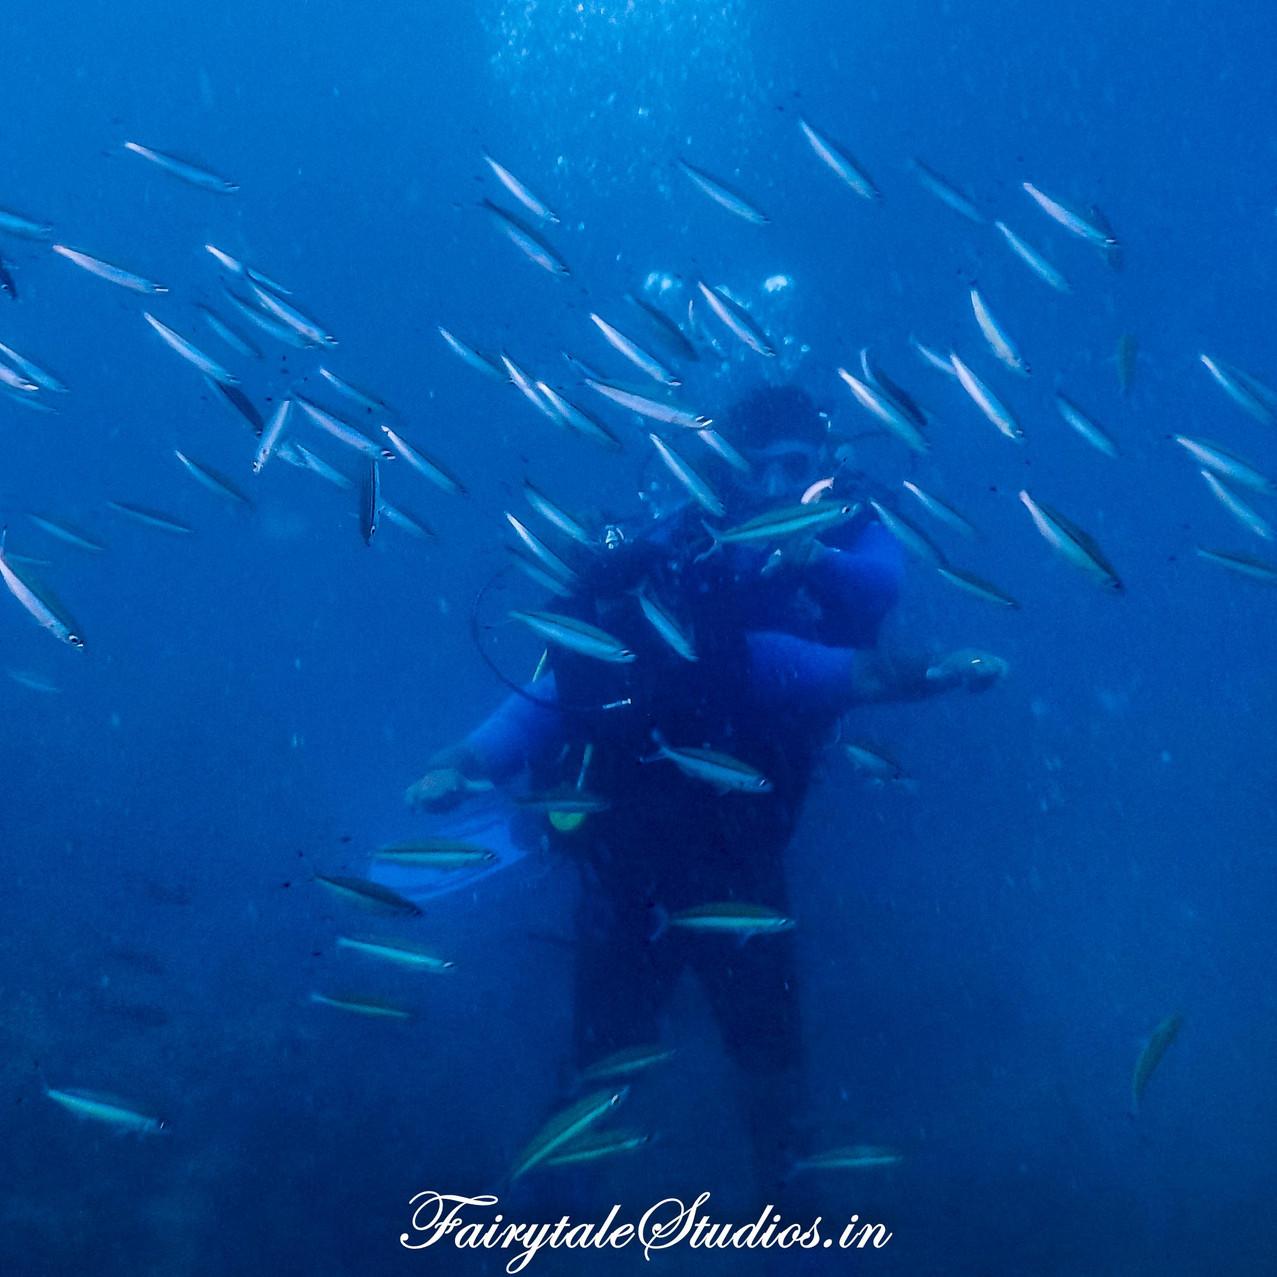 Scuba_Havelock_The Andaman Odyssey_Fairytale Travels(2)